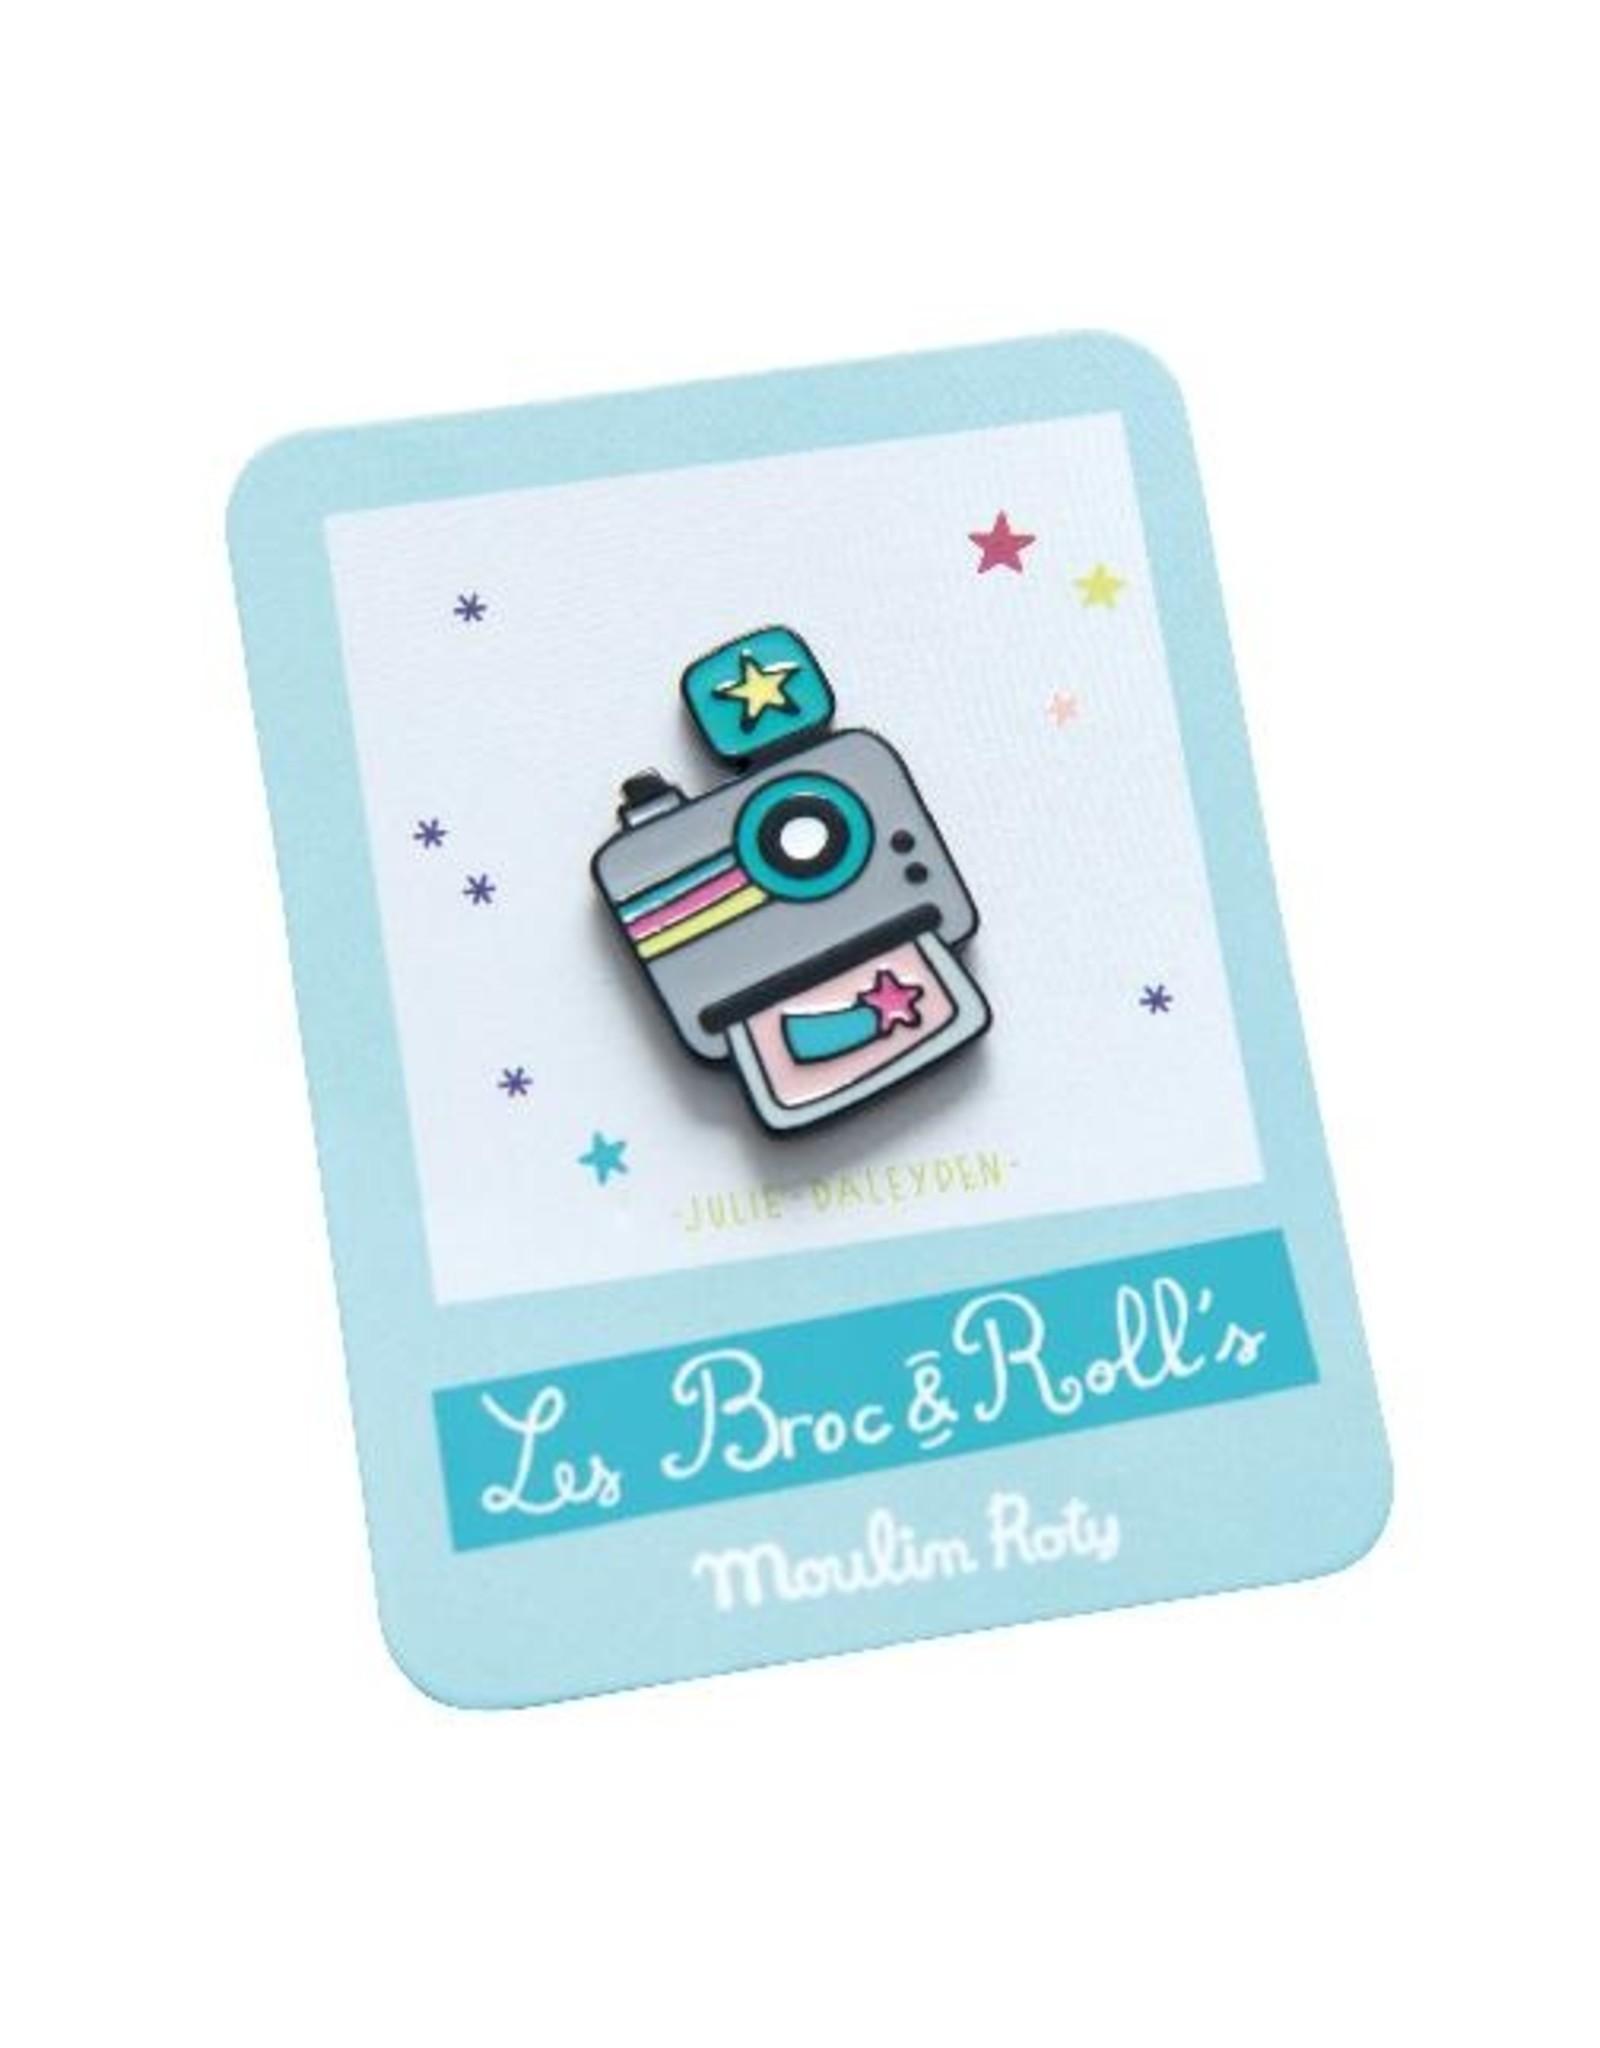 Moulin Roty Broc' & Rolls - Camera Enamel Pin